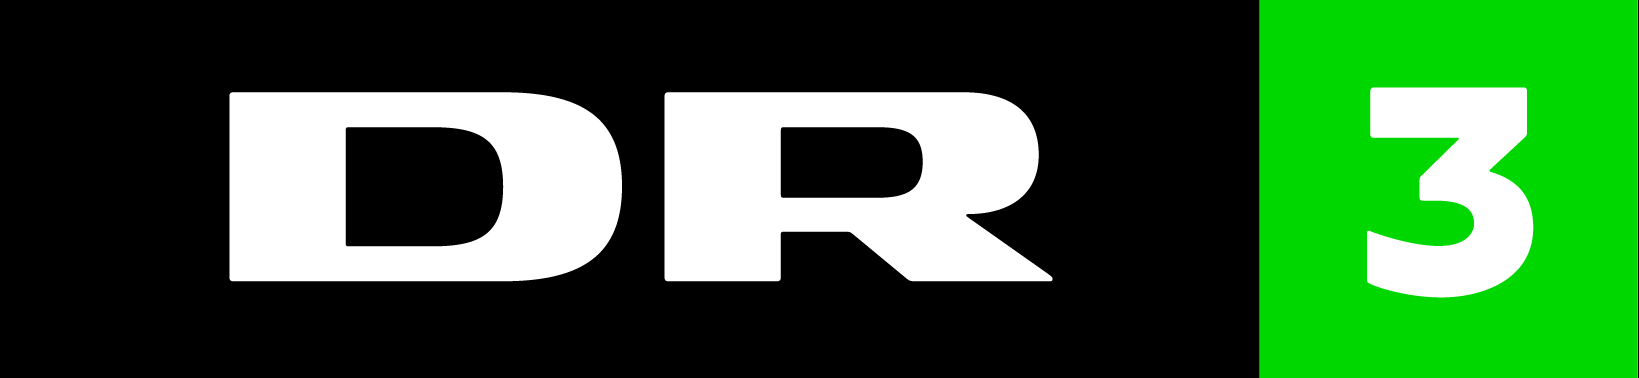 dr_3_rgb_okt2015_rt1.png